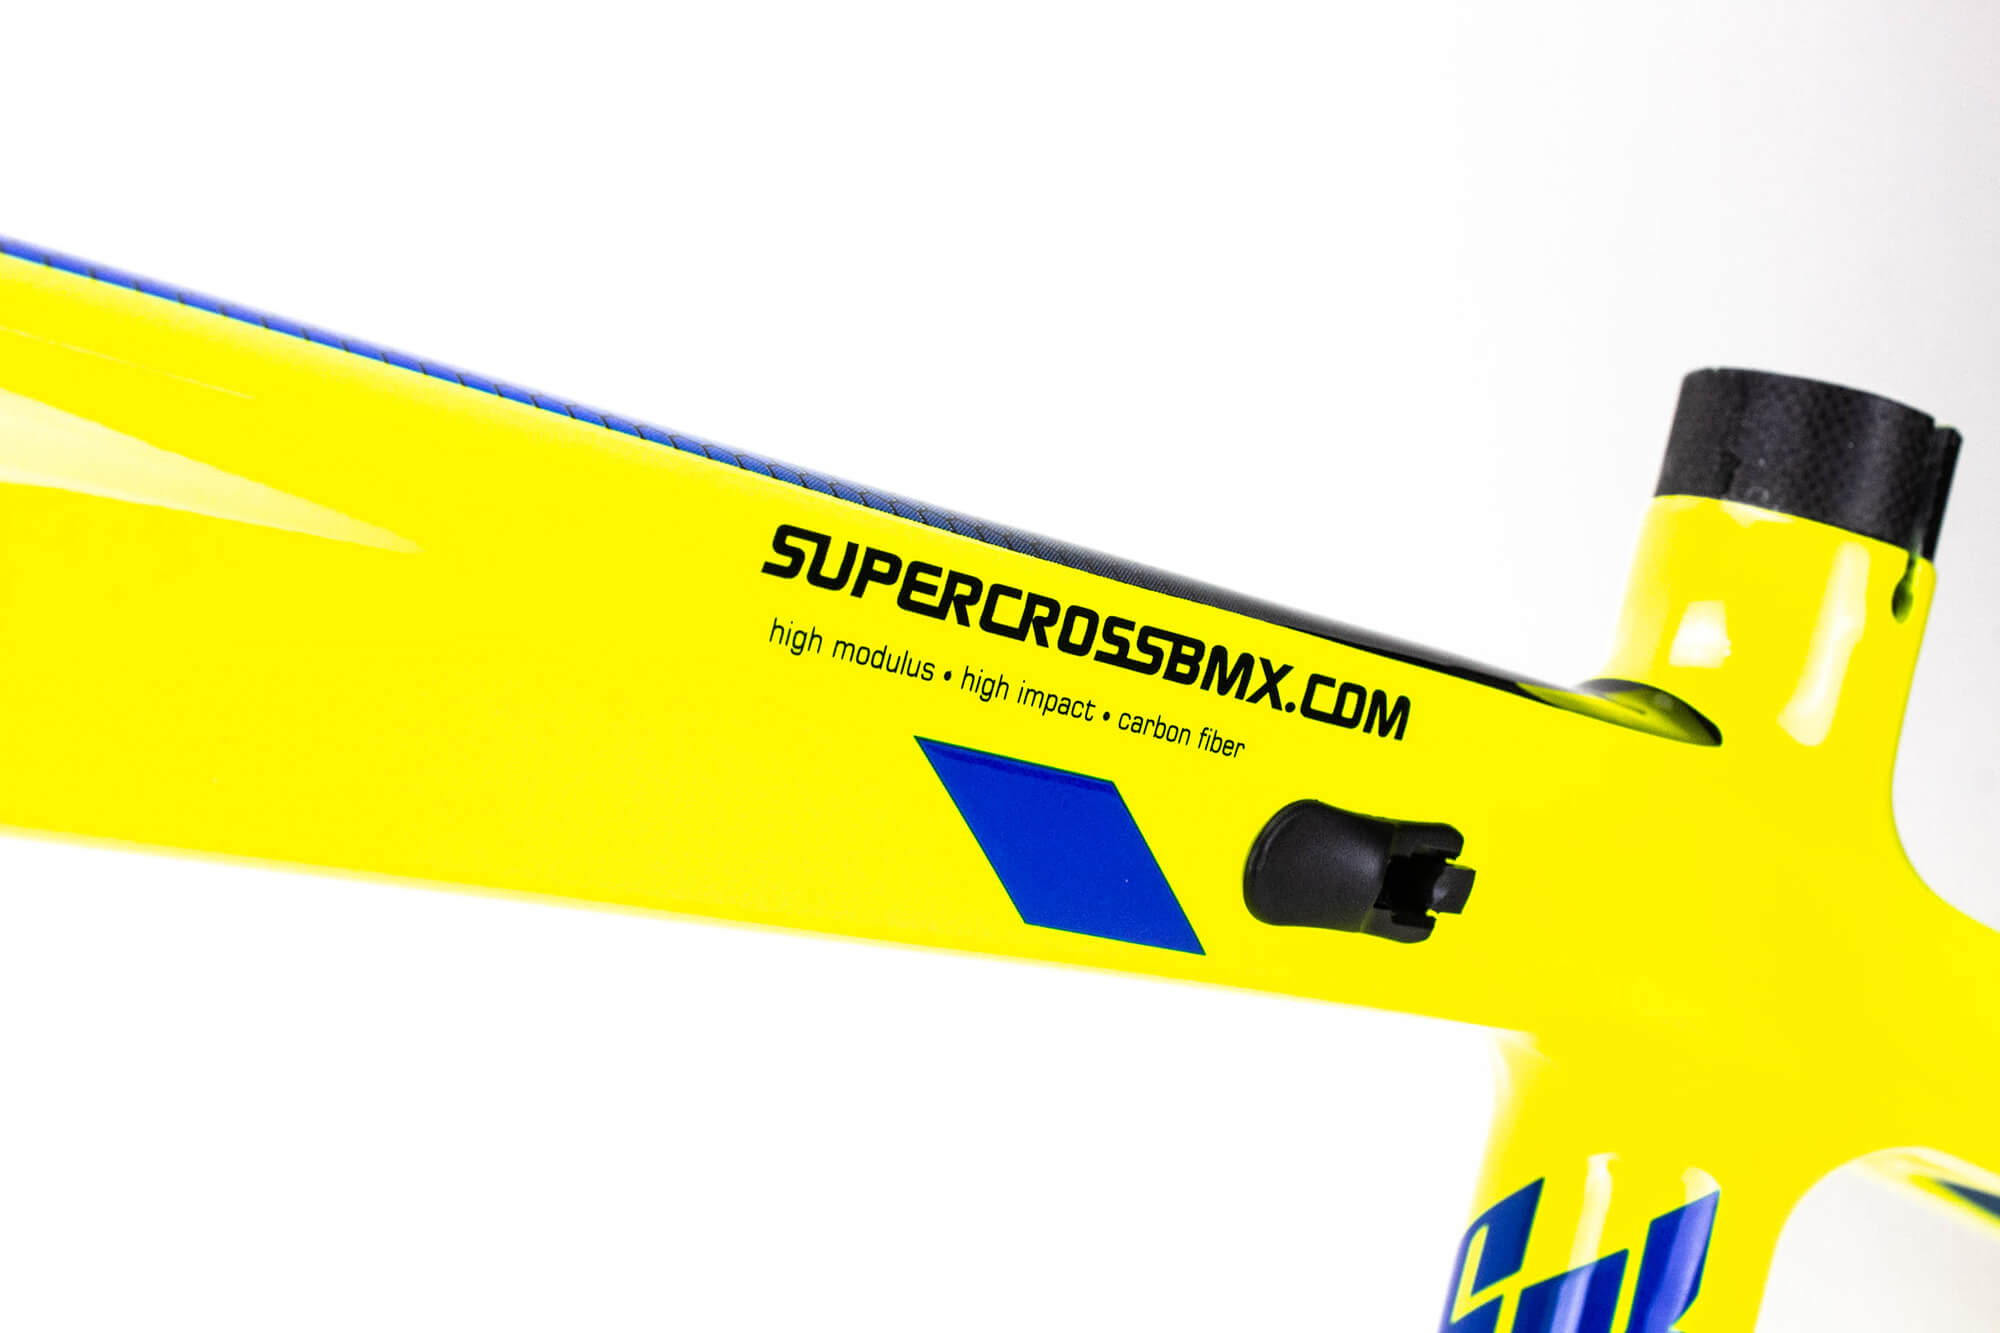 Supercross BMX Vision F1